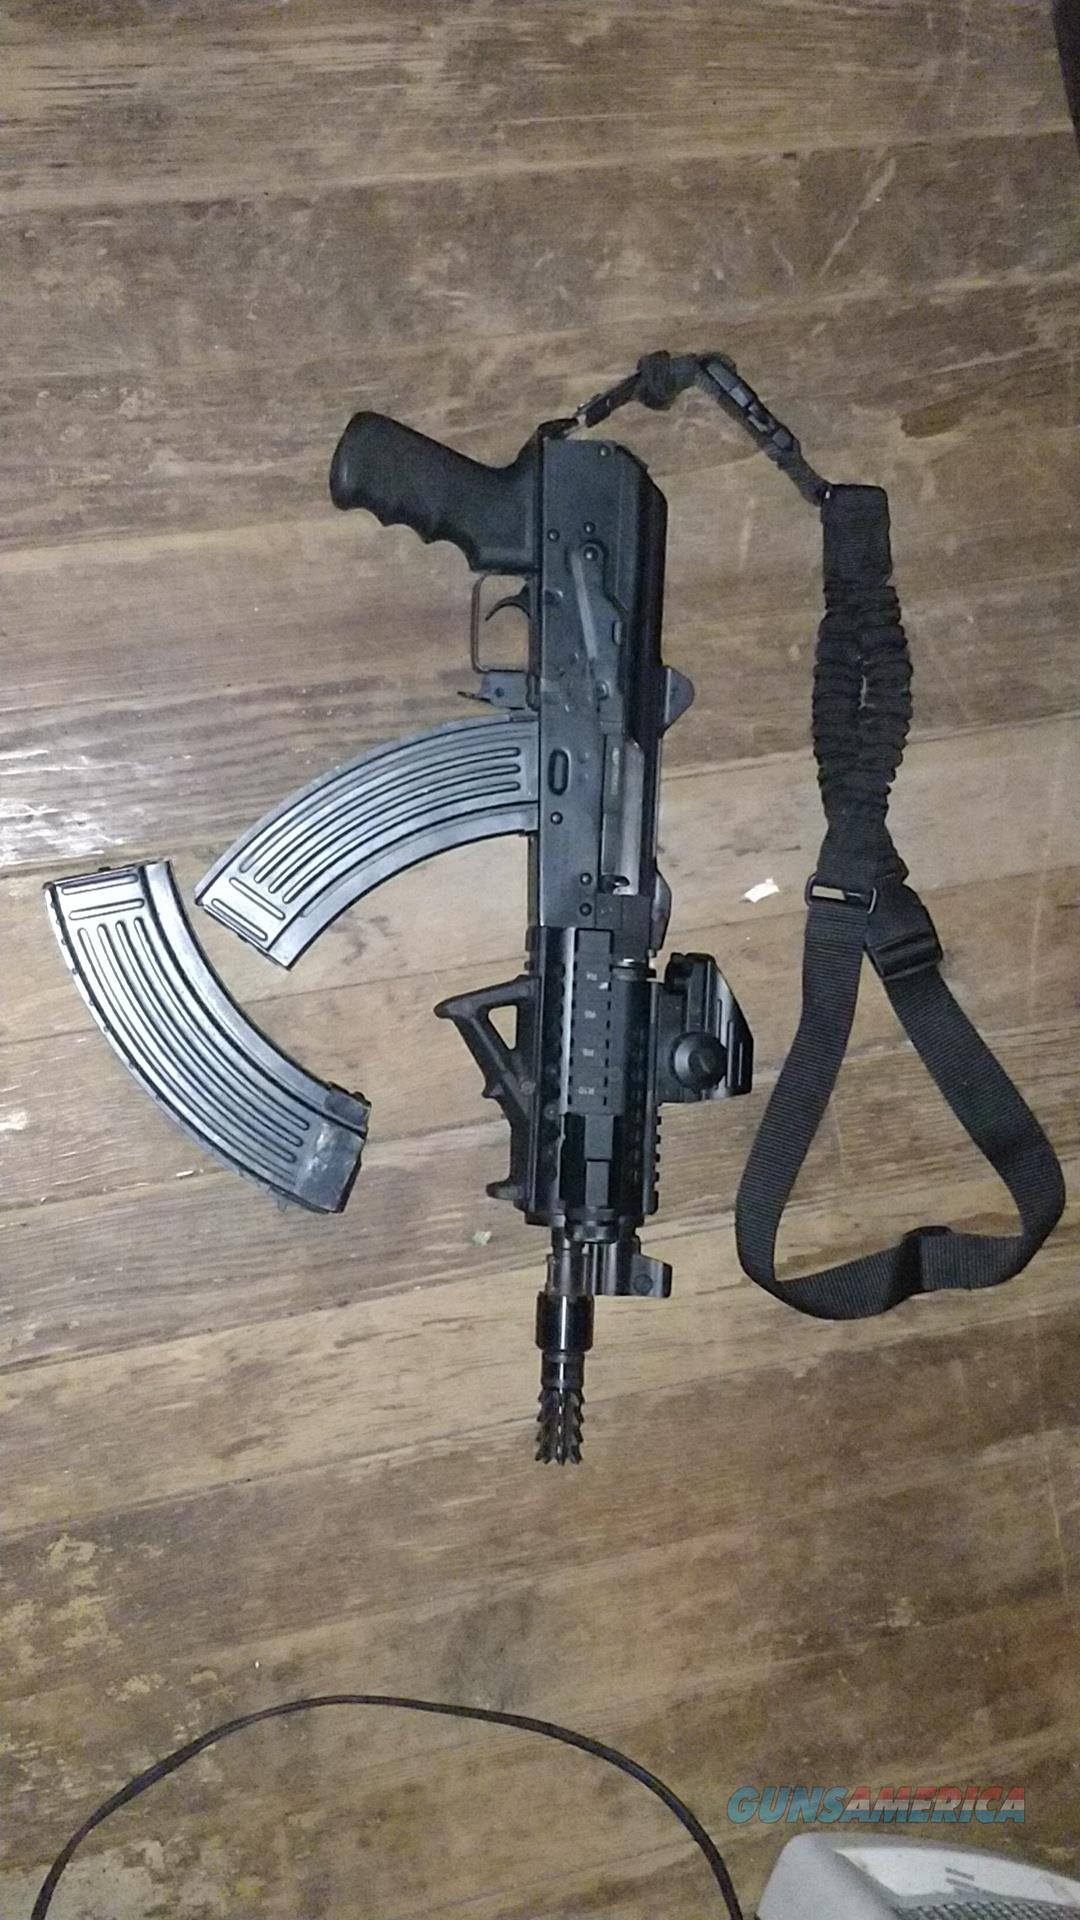 M92 AK Pistol (custom with extras)  Guns > Pistols > AK-47 Pistols